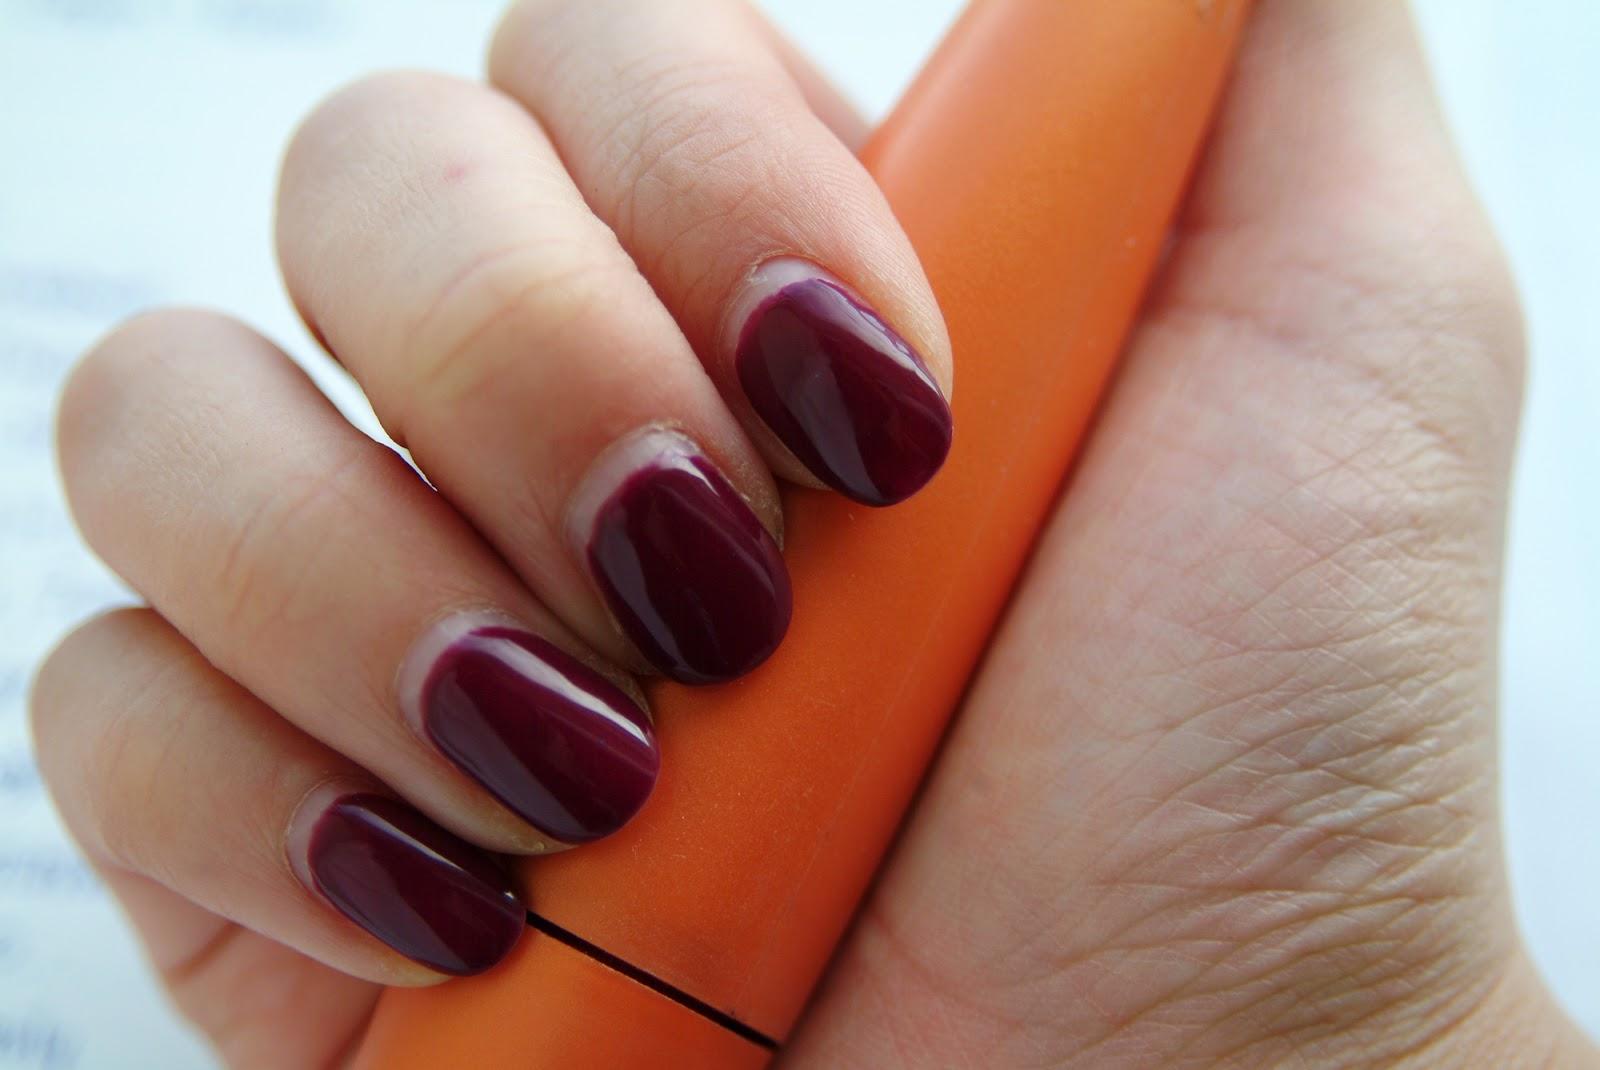 Fun Size Beauty My First Gel Manicure With Bio Seaweed Gel Nail Polish